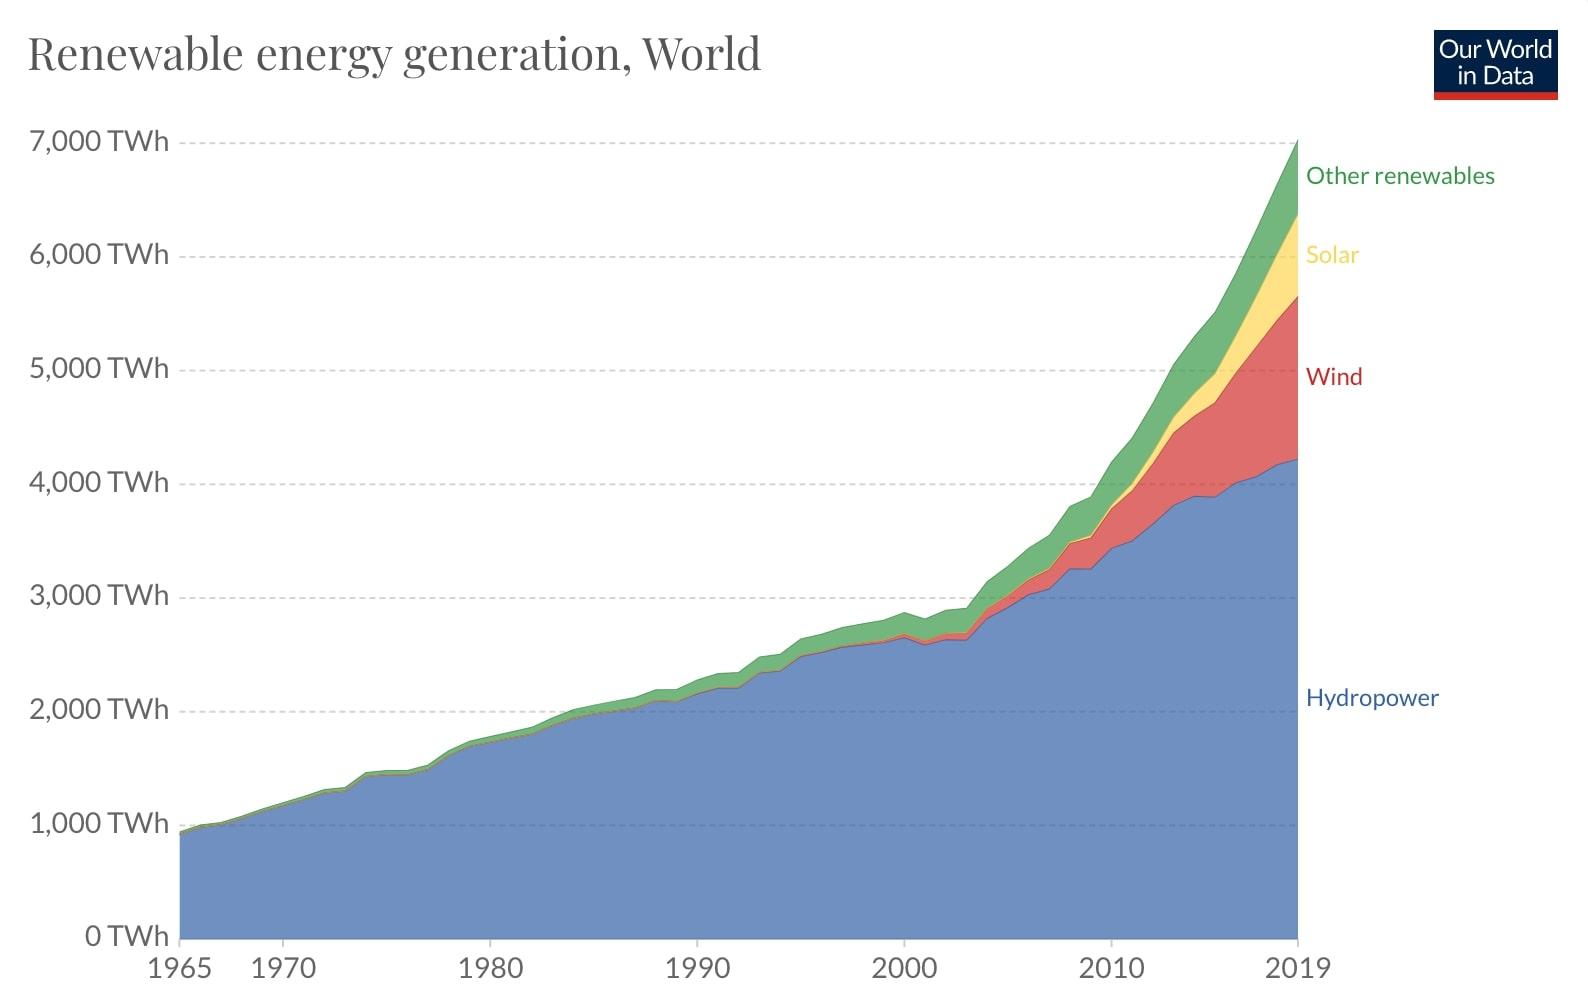 renewable energy generation sources